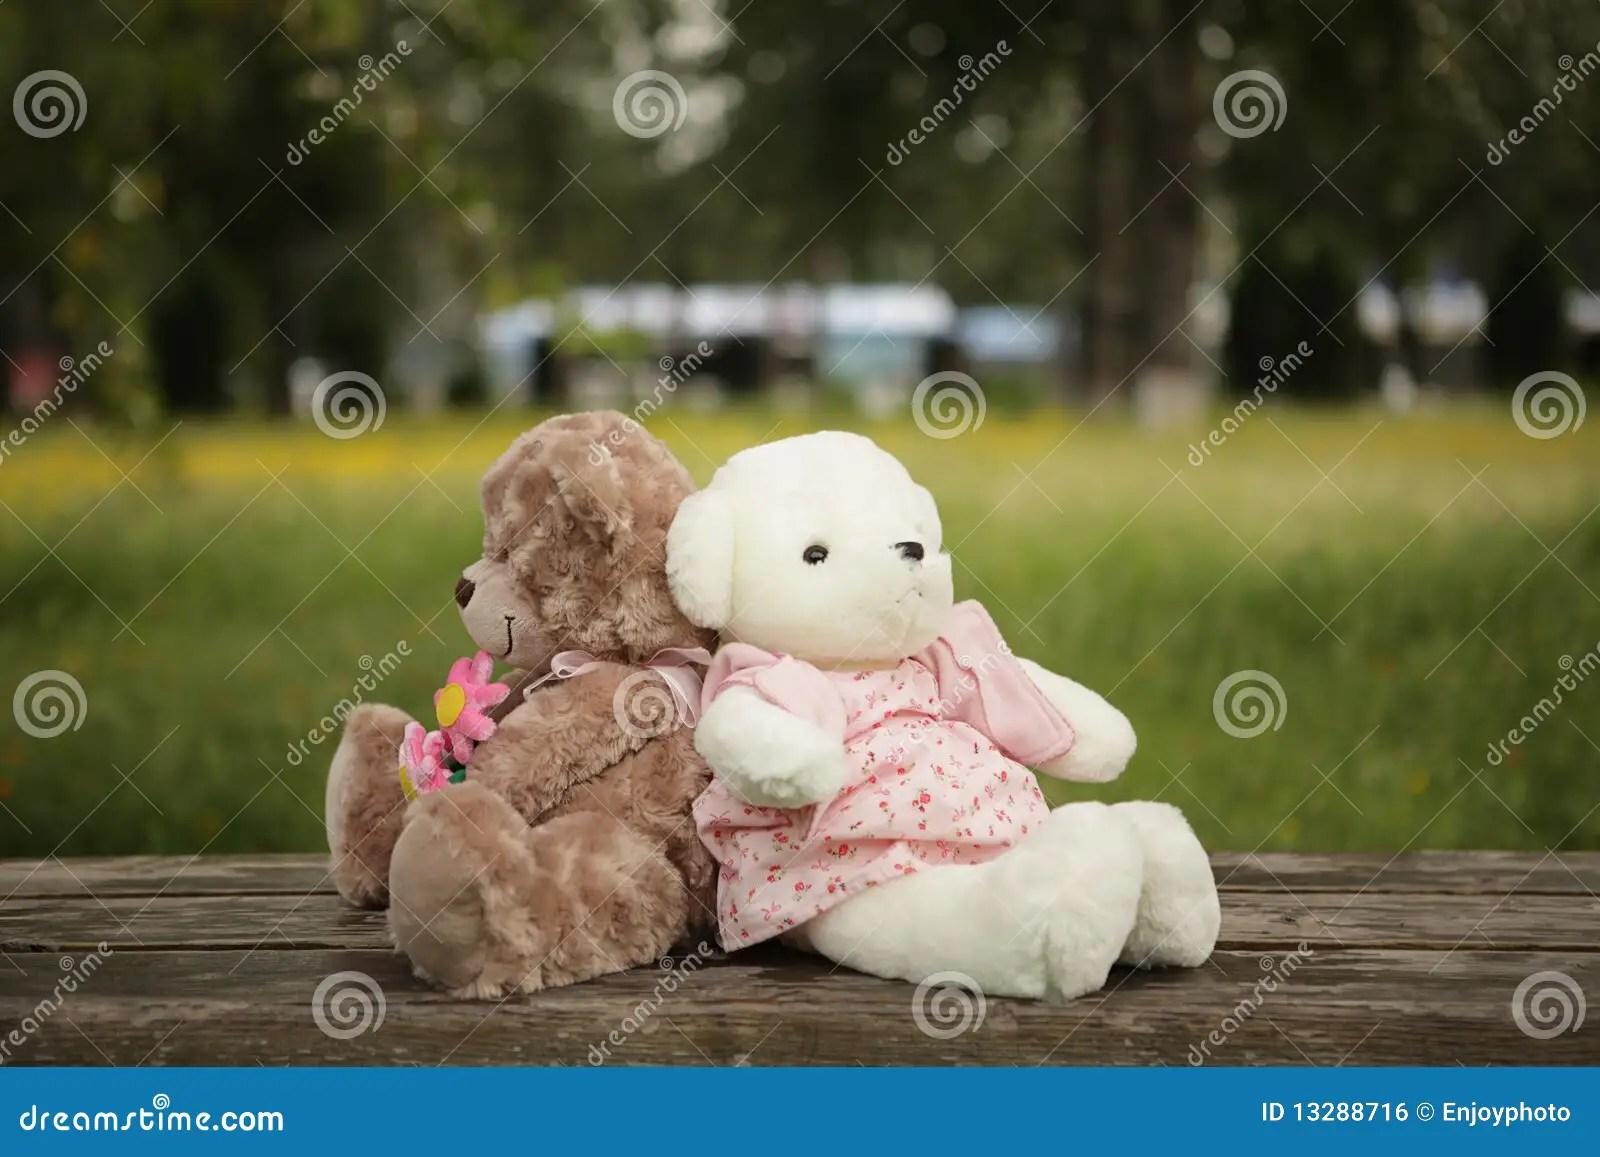 Free Cute Couple Wallpaper Romantic Teddy Bears Stock Photo Image Of Couple